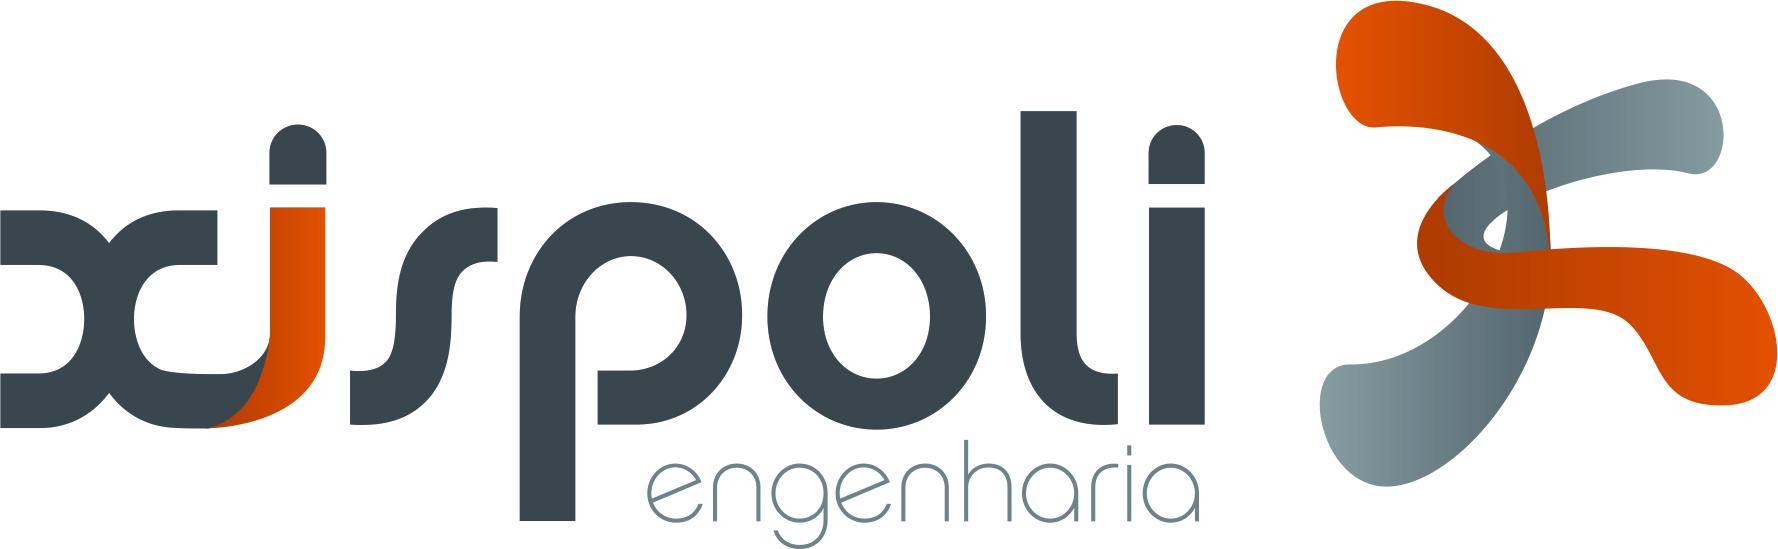 logo_xispoli